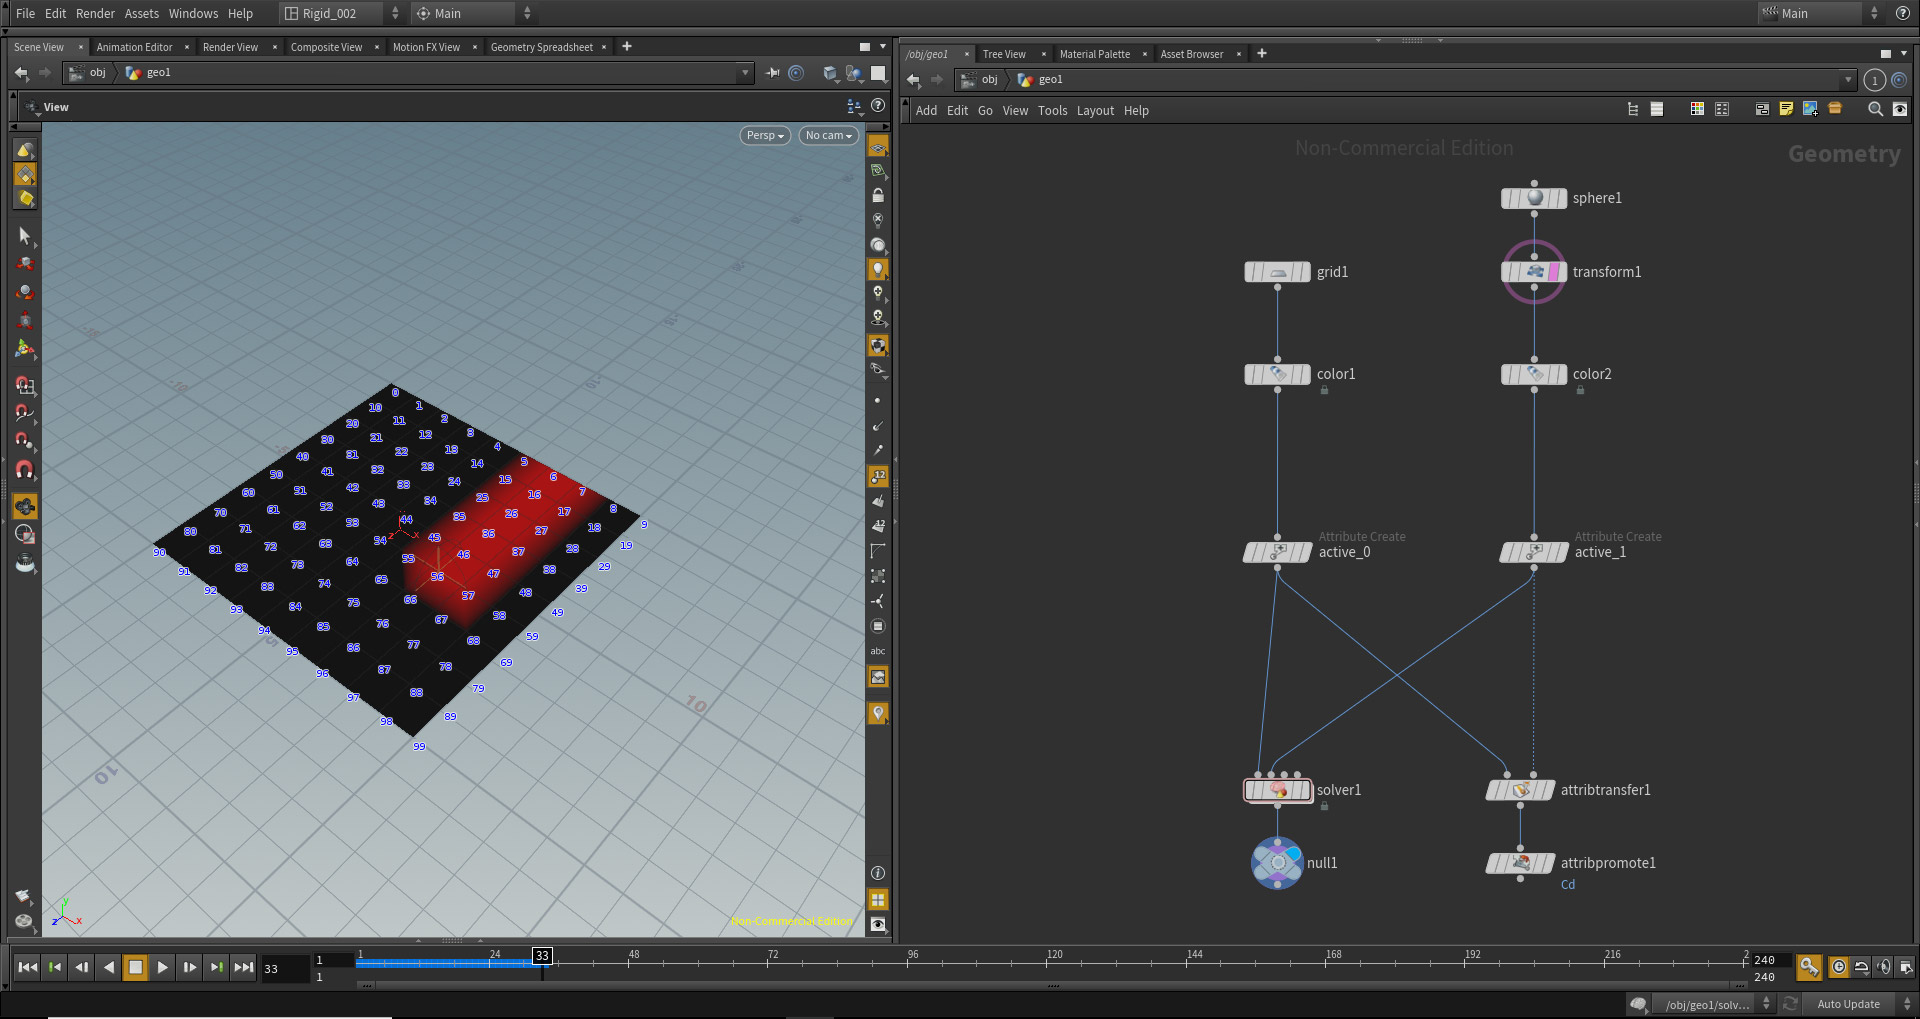 SideFX Houdini 201 - Dynamics & Fracture - corso_004 | 3DArt